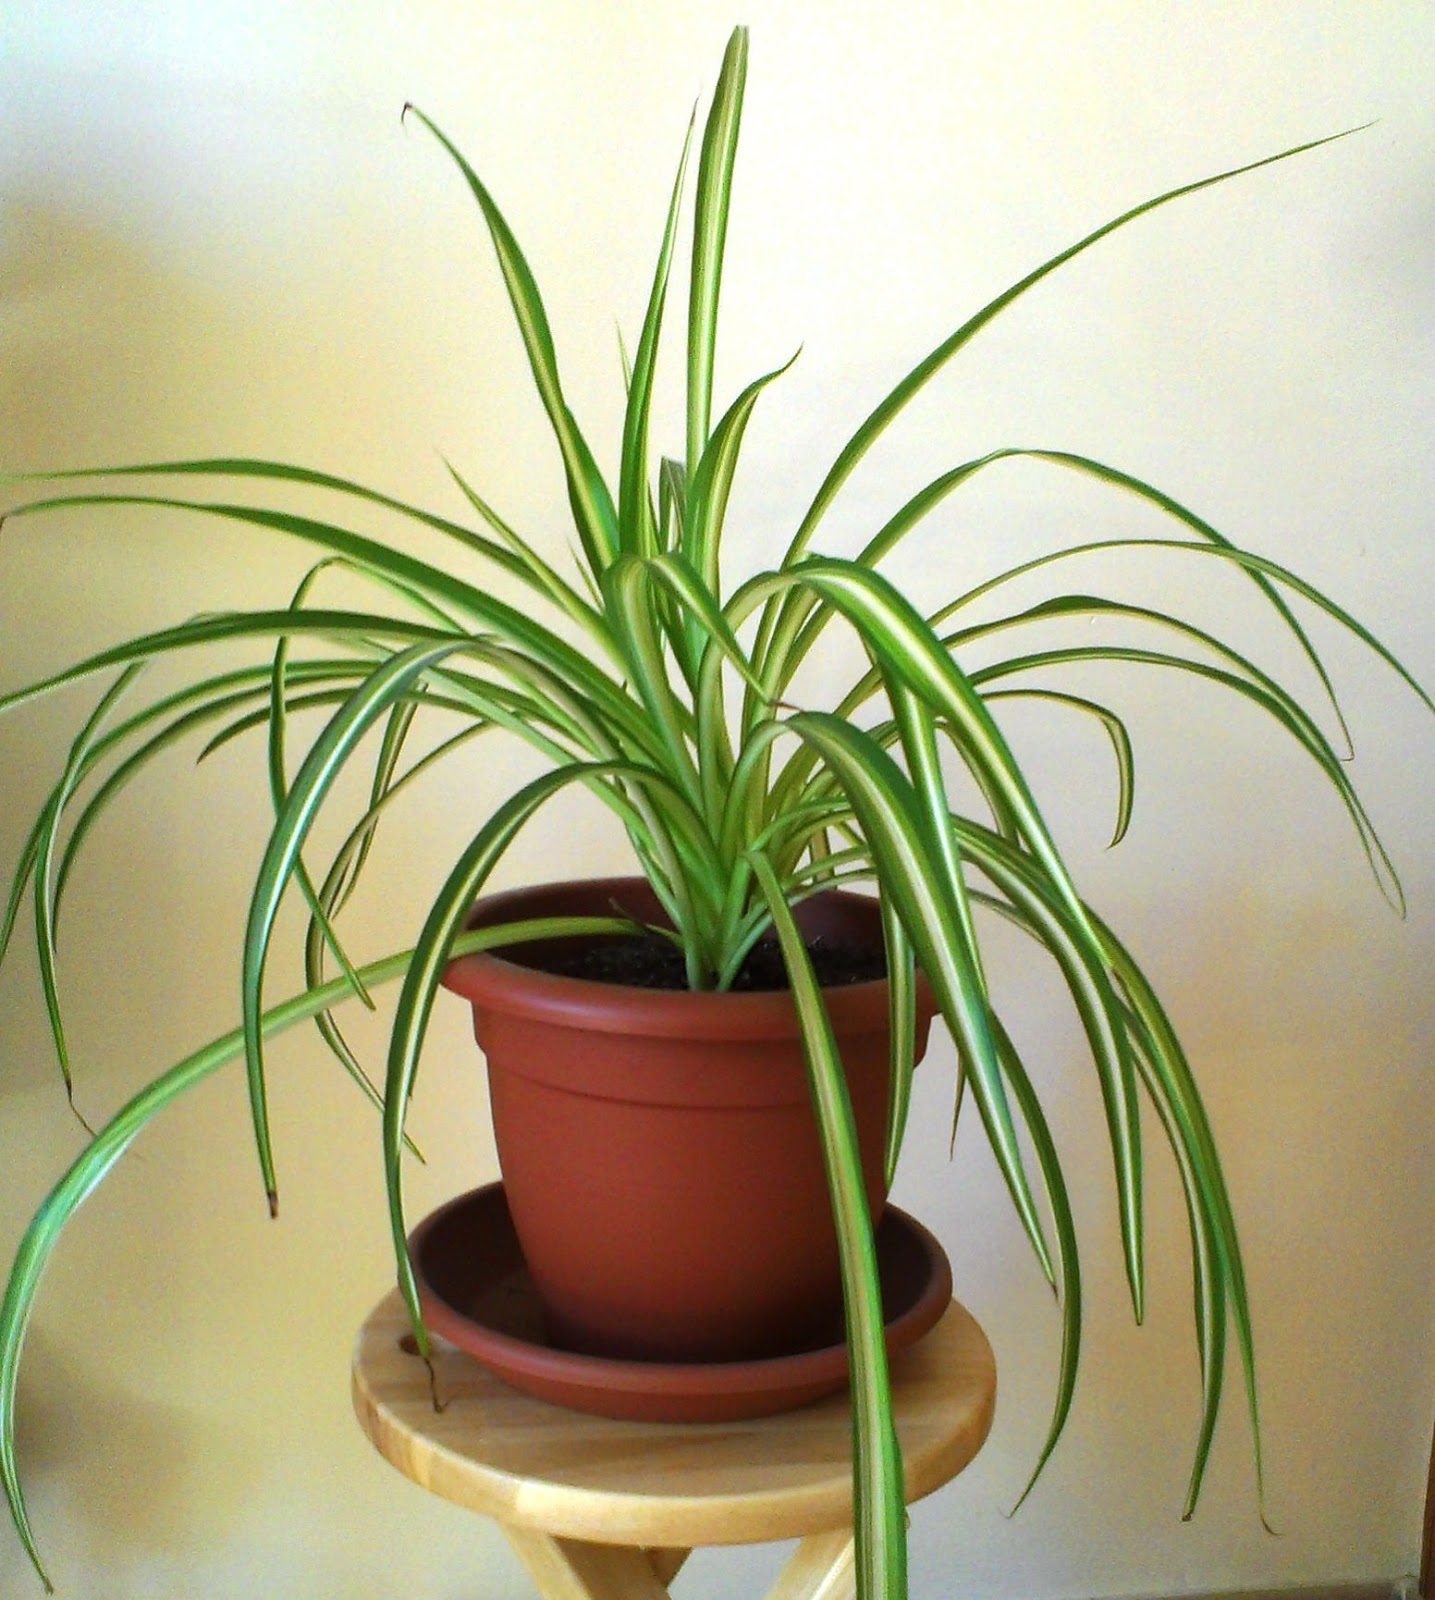 les plantes de peg chlrorophytum comosum plante araign e. Black Bedroom Furniture Sets. Home Design Ideas